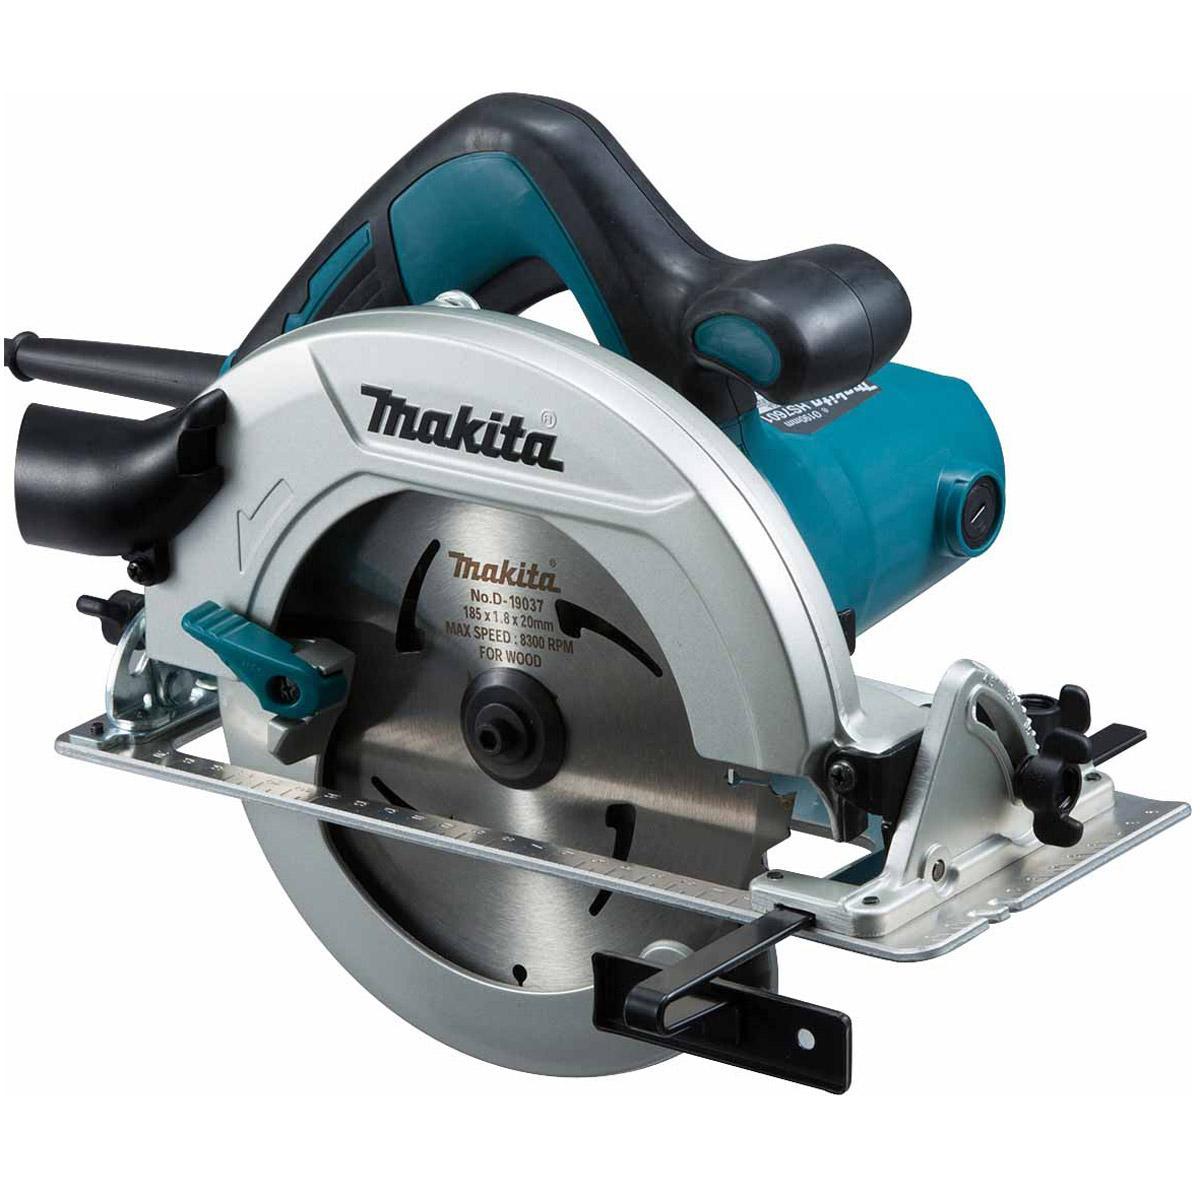 MAKITA HS7601J 190MM CIRCULAR SAW 110V lowest price